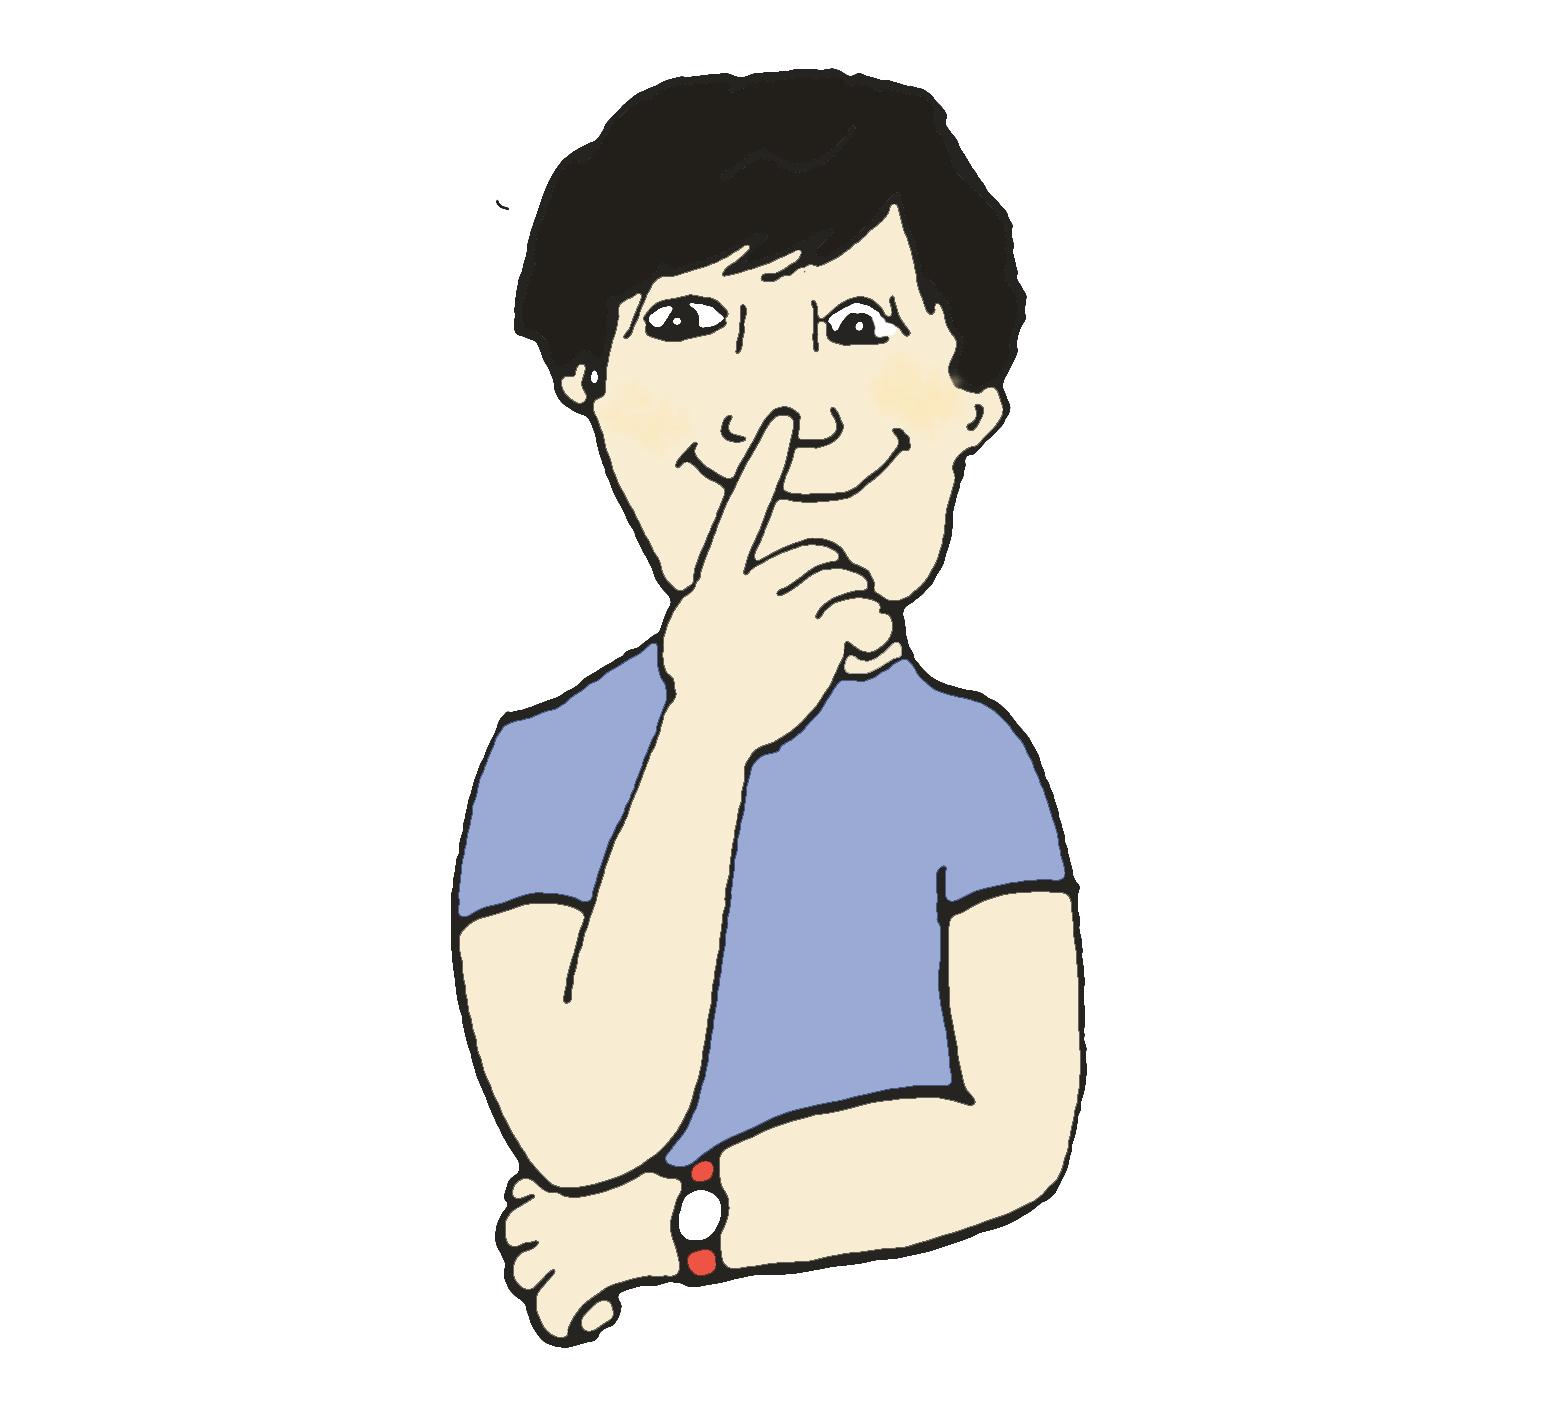 Graceful Japanese Body Language Key Gestures Japanese Body Key Gestures To Learn Gaijinpot Hands Rubbing Face Meme bark post Rubbing Face Meme